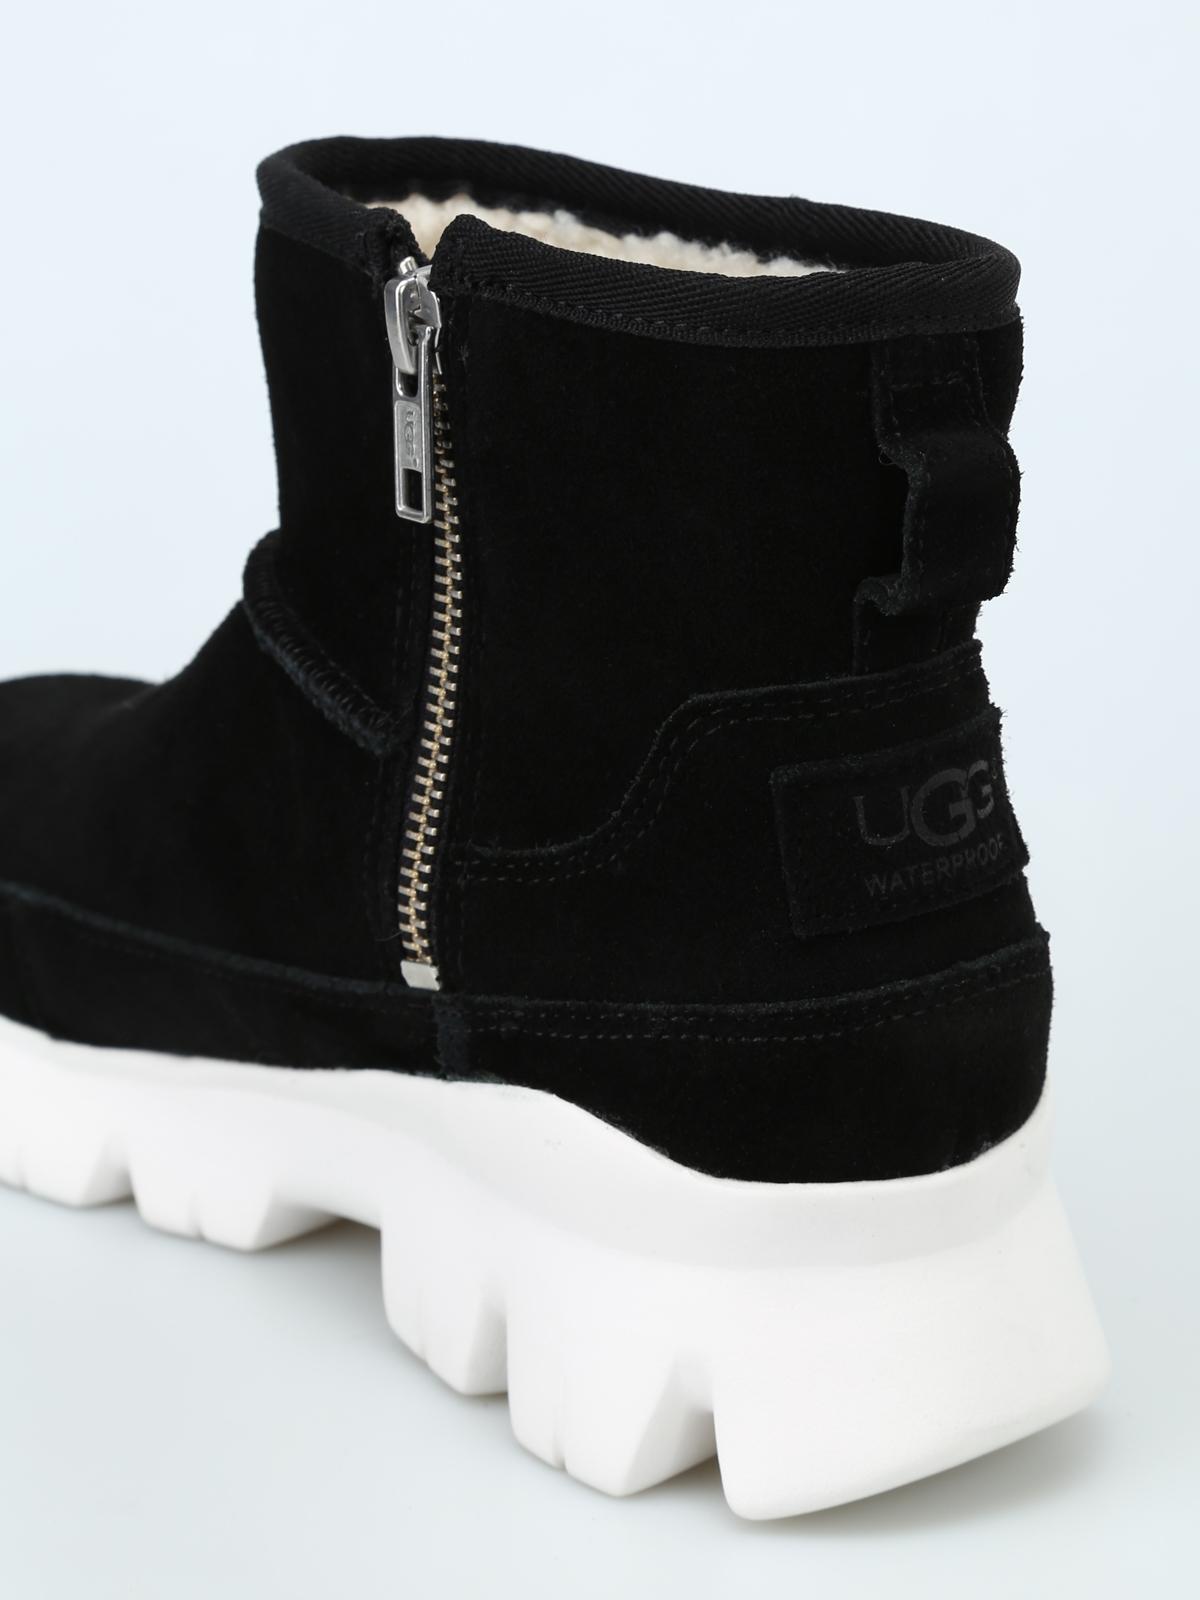 4b1f4001a52 Ugg - Palomar black waterproof suede booties - ankle boots - 1095541 ...